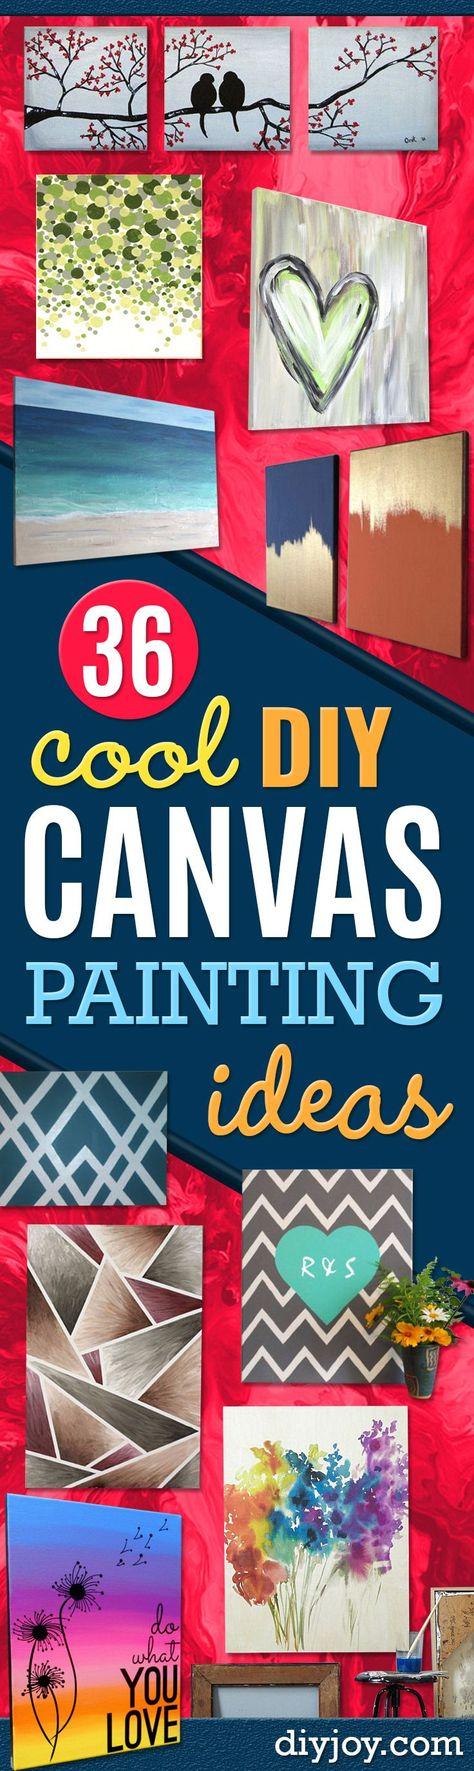 Painting Ideas On Canvas For Teens Easy 56 Ideas